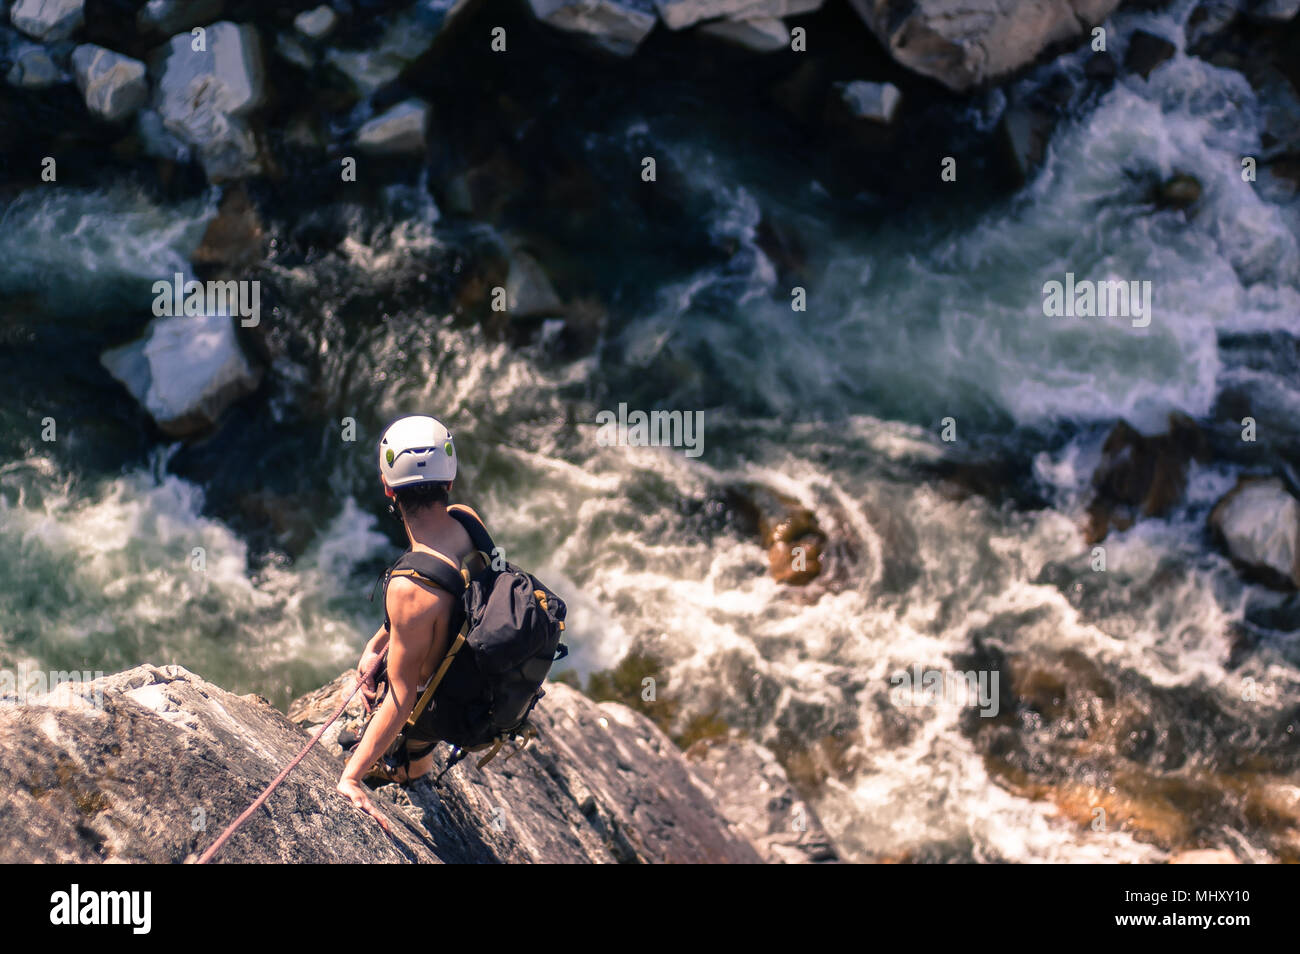 Hombre trad escalar al jefe, Squamish, Canadá Imagen De Stock